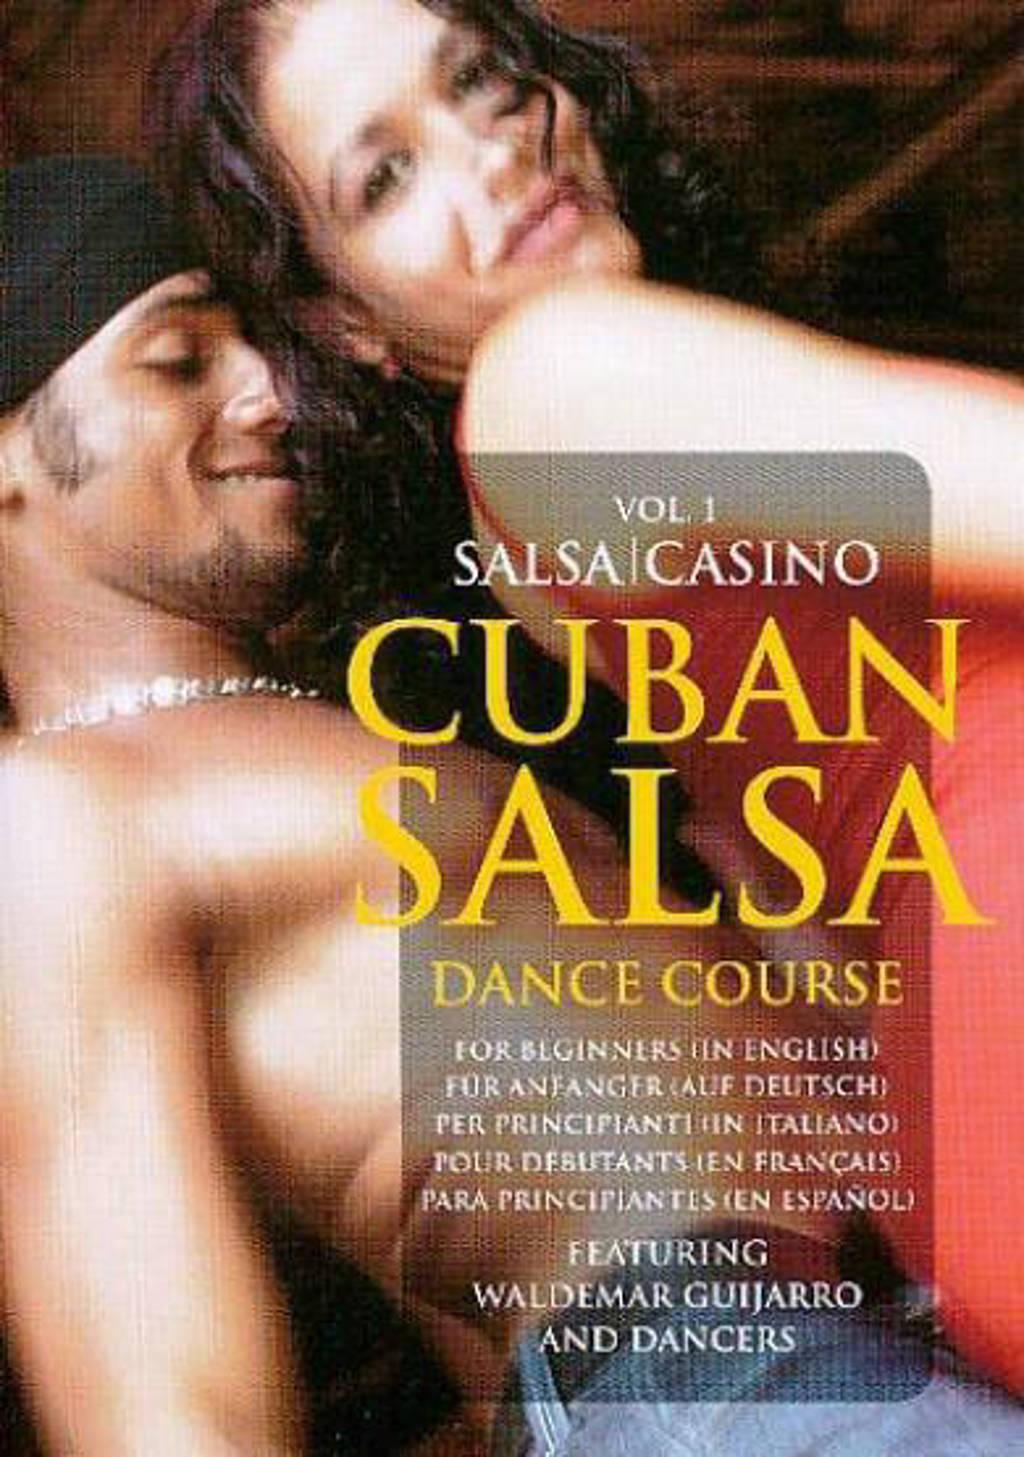 Cuban Salsa Volume 1 Dance Course (DVD)